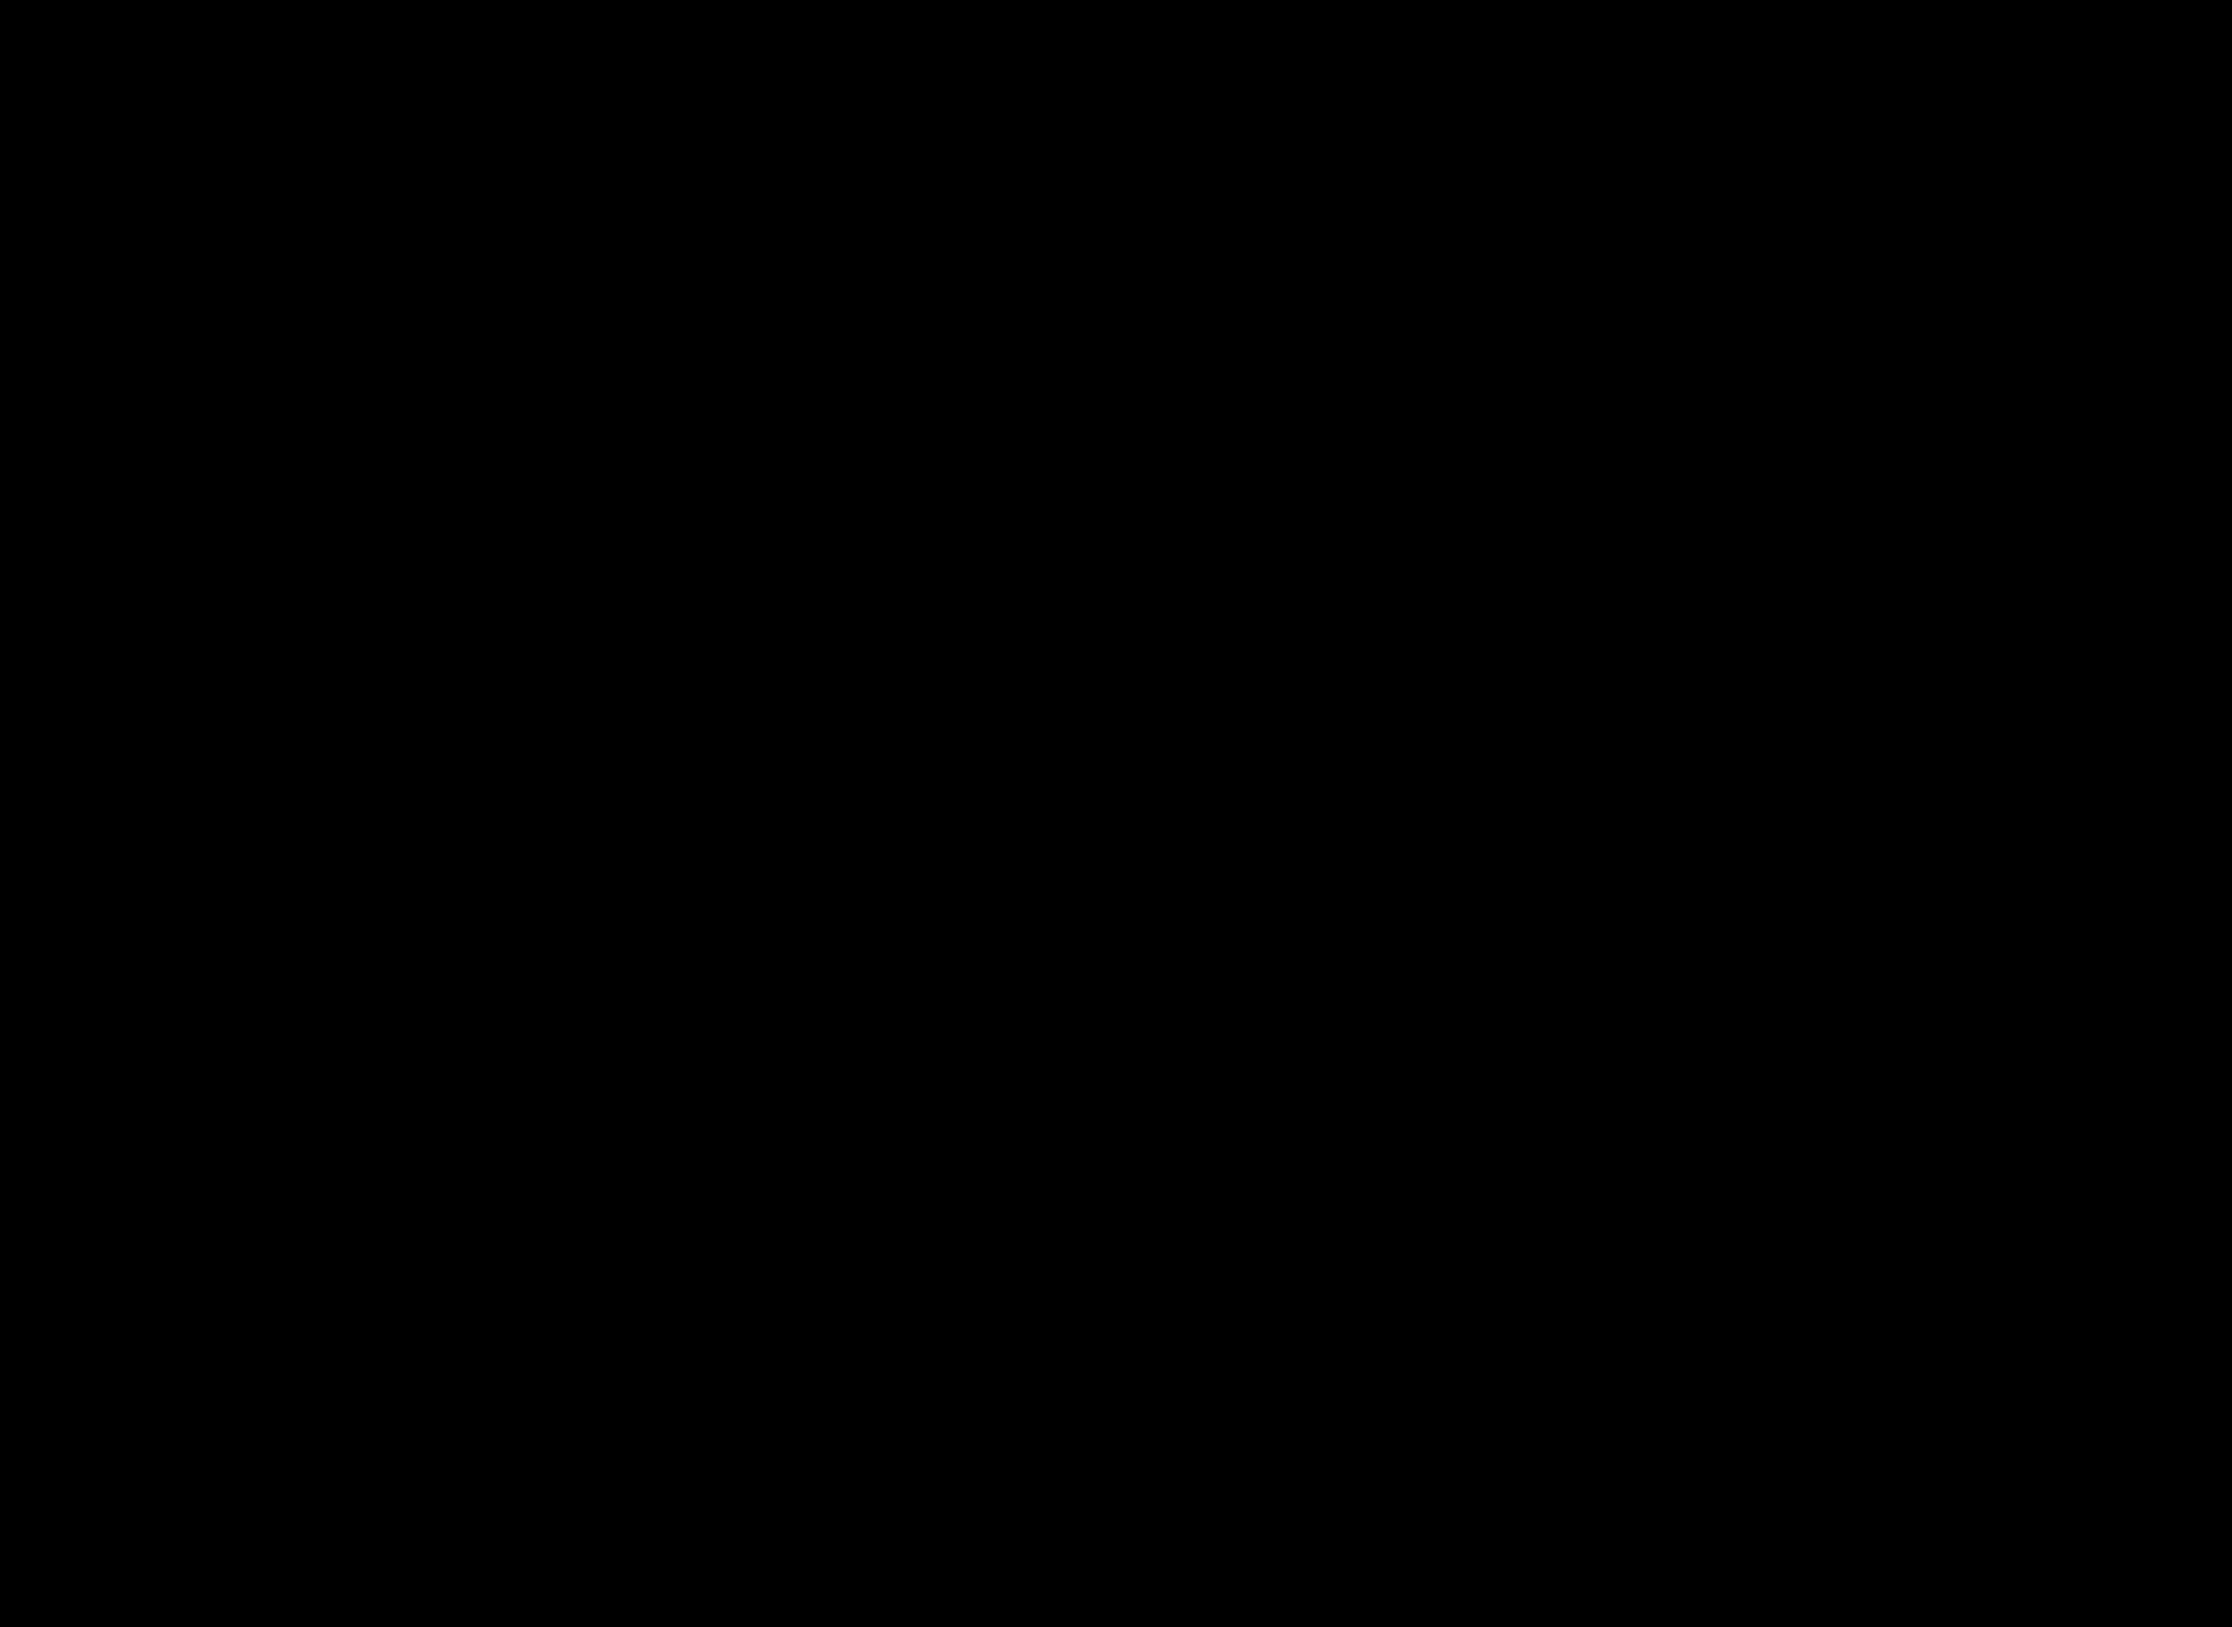 2232x1627 Clipart